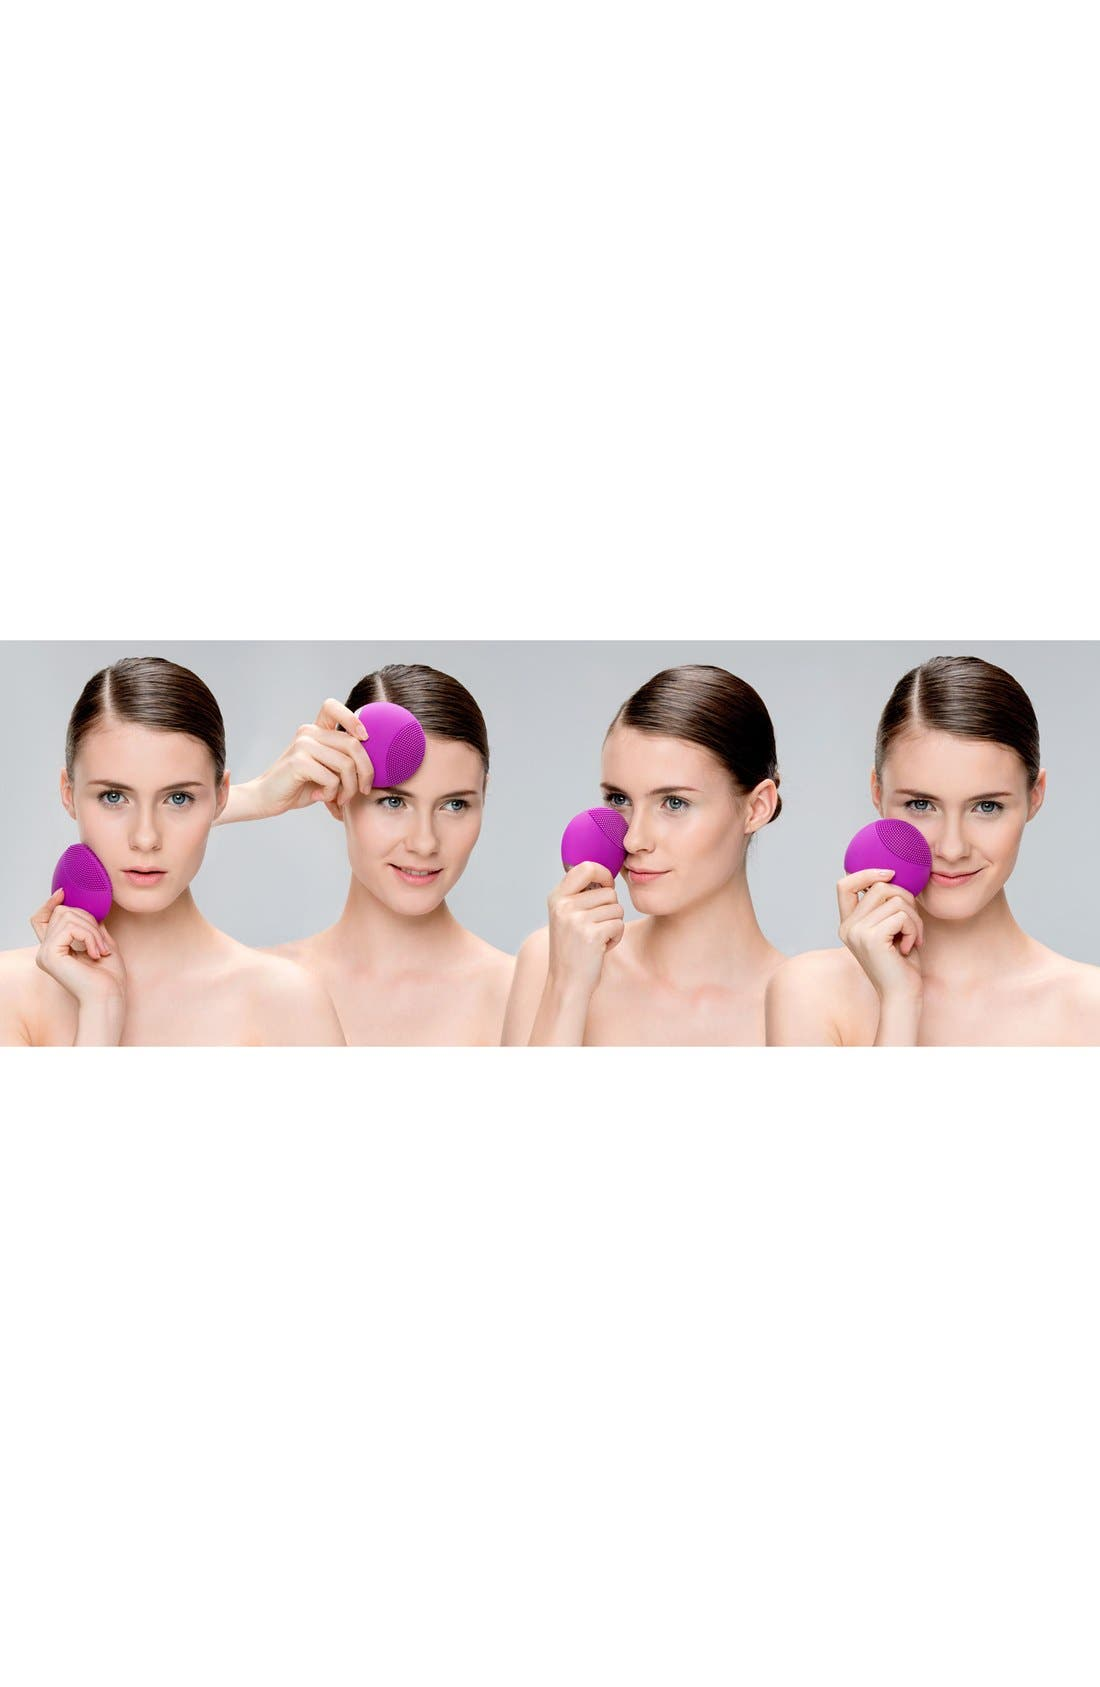 LUNA<sup>™</sup> mini Compact Facial Cleansing Device,                             Alternate thumbnail 6, color,                             PURPLE